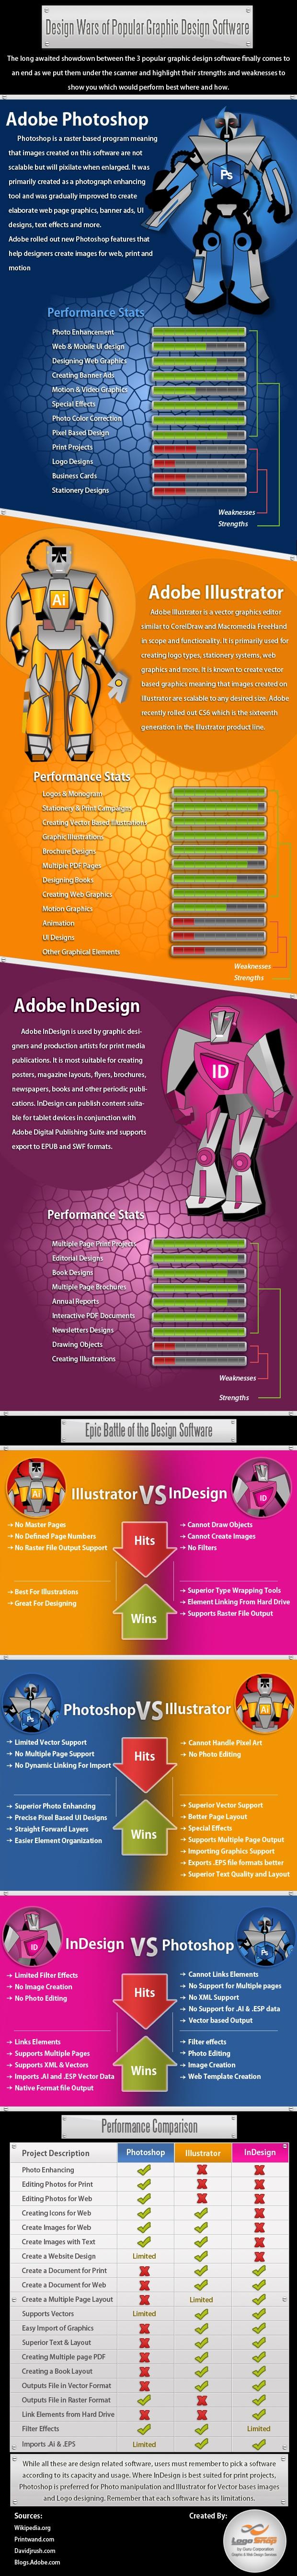 Epic Battle of Graphic Design Software